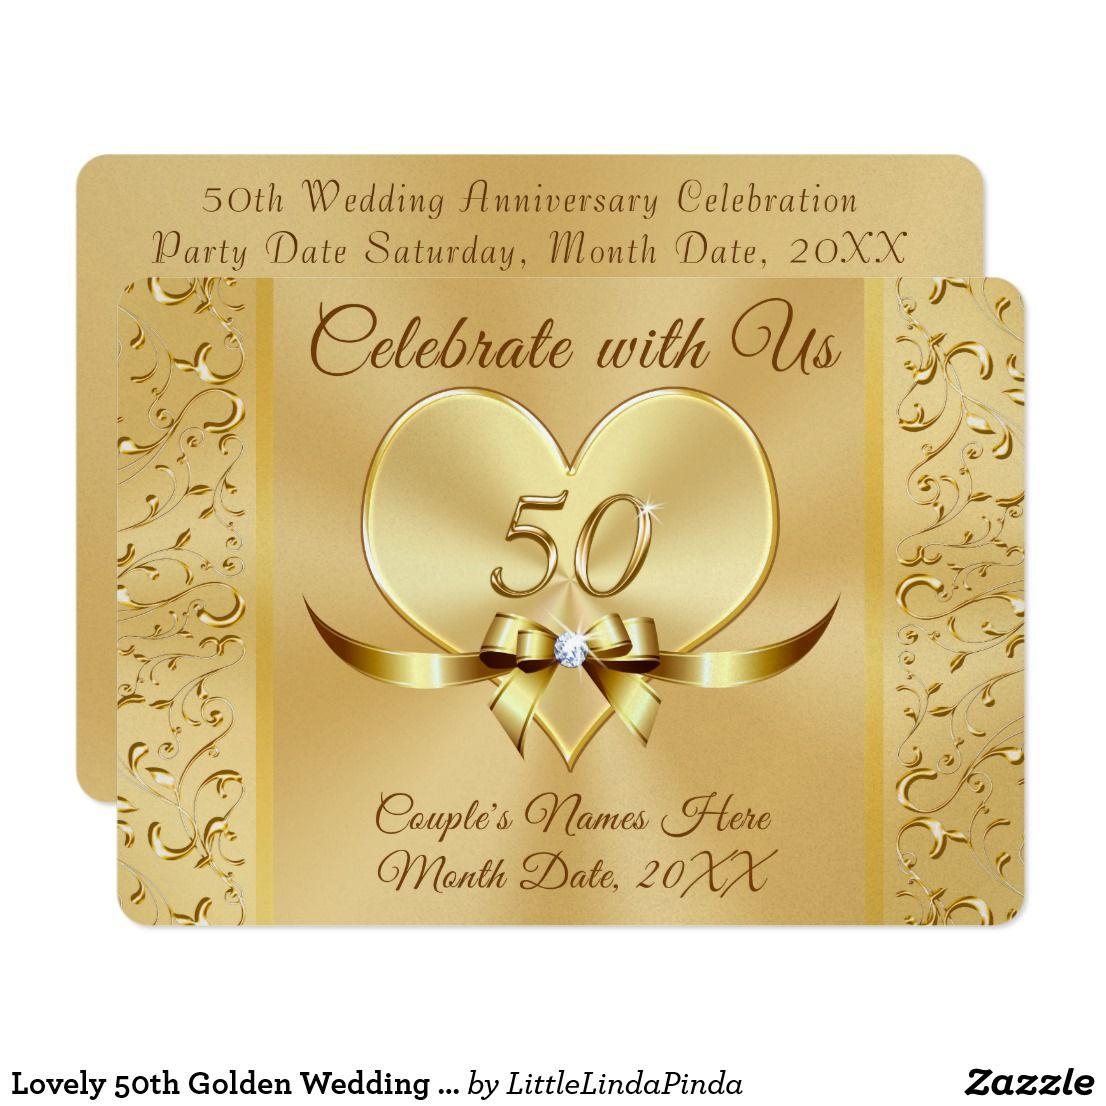 Lovely 50th Golden Wedding Anniversary Invitations | Golden wedding ...